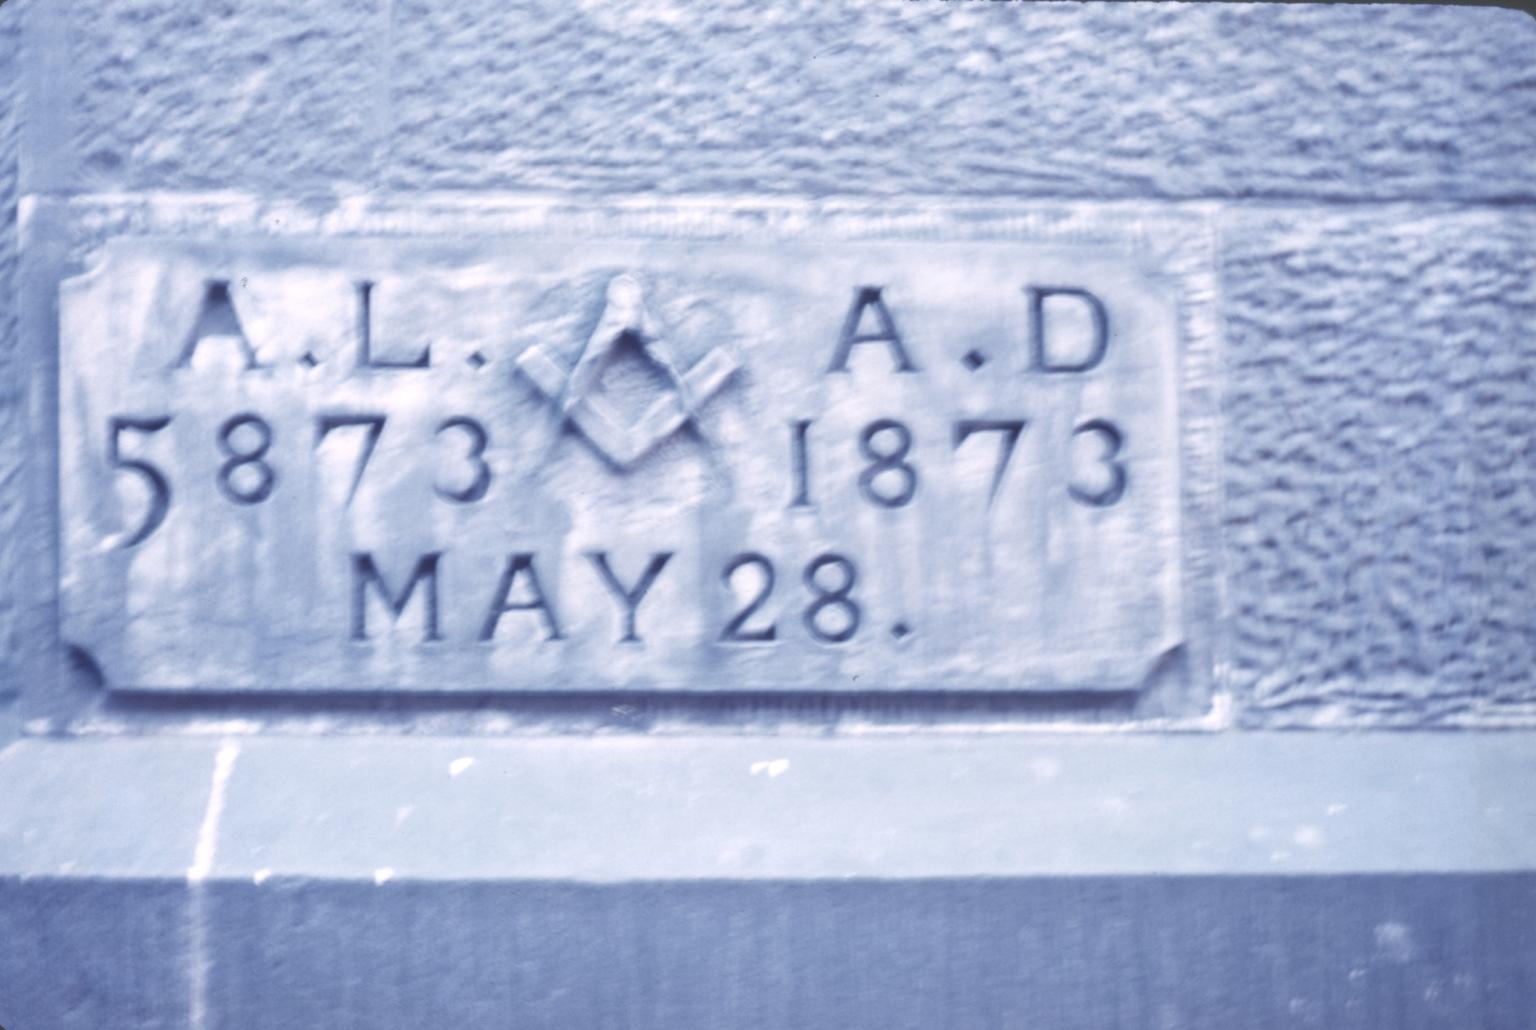 Building plaque